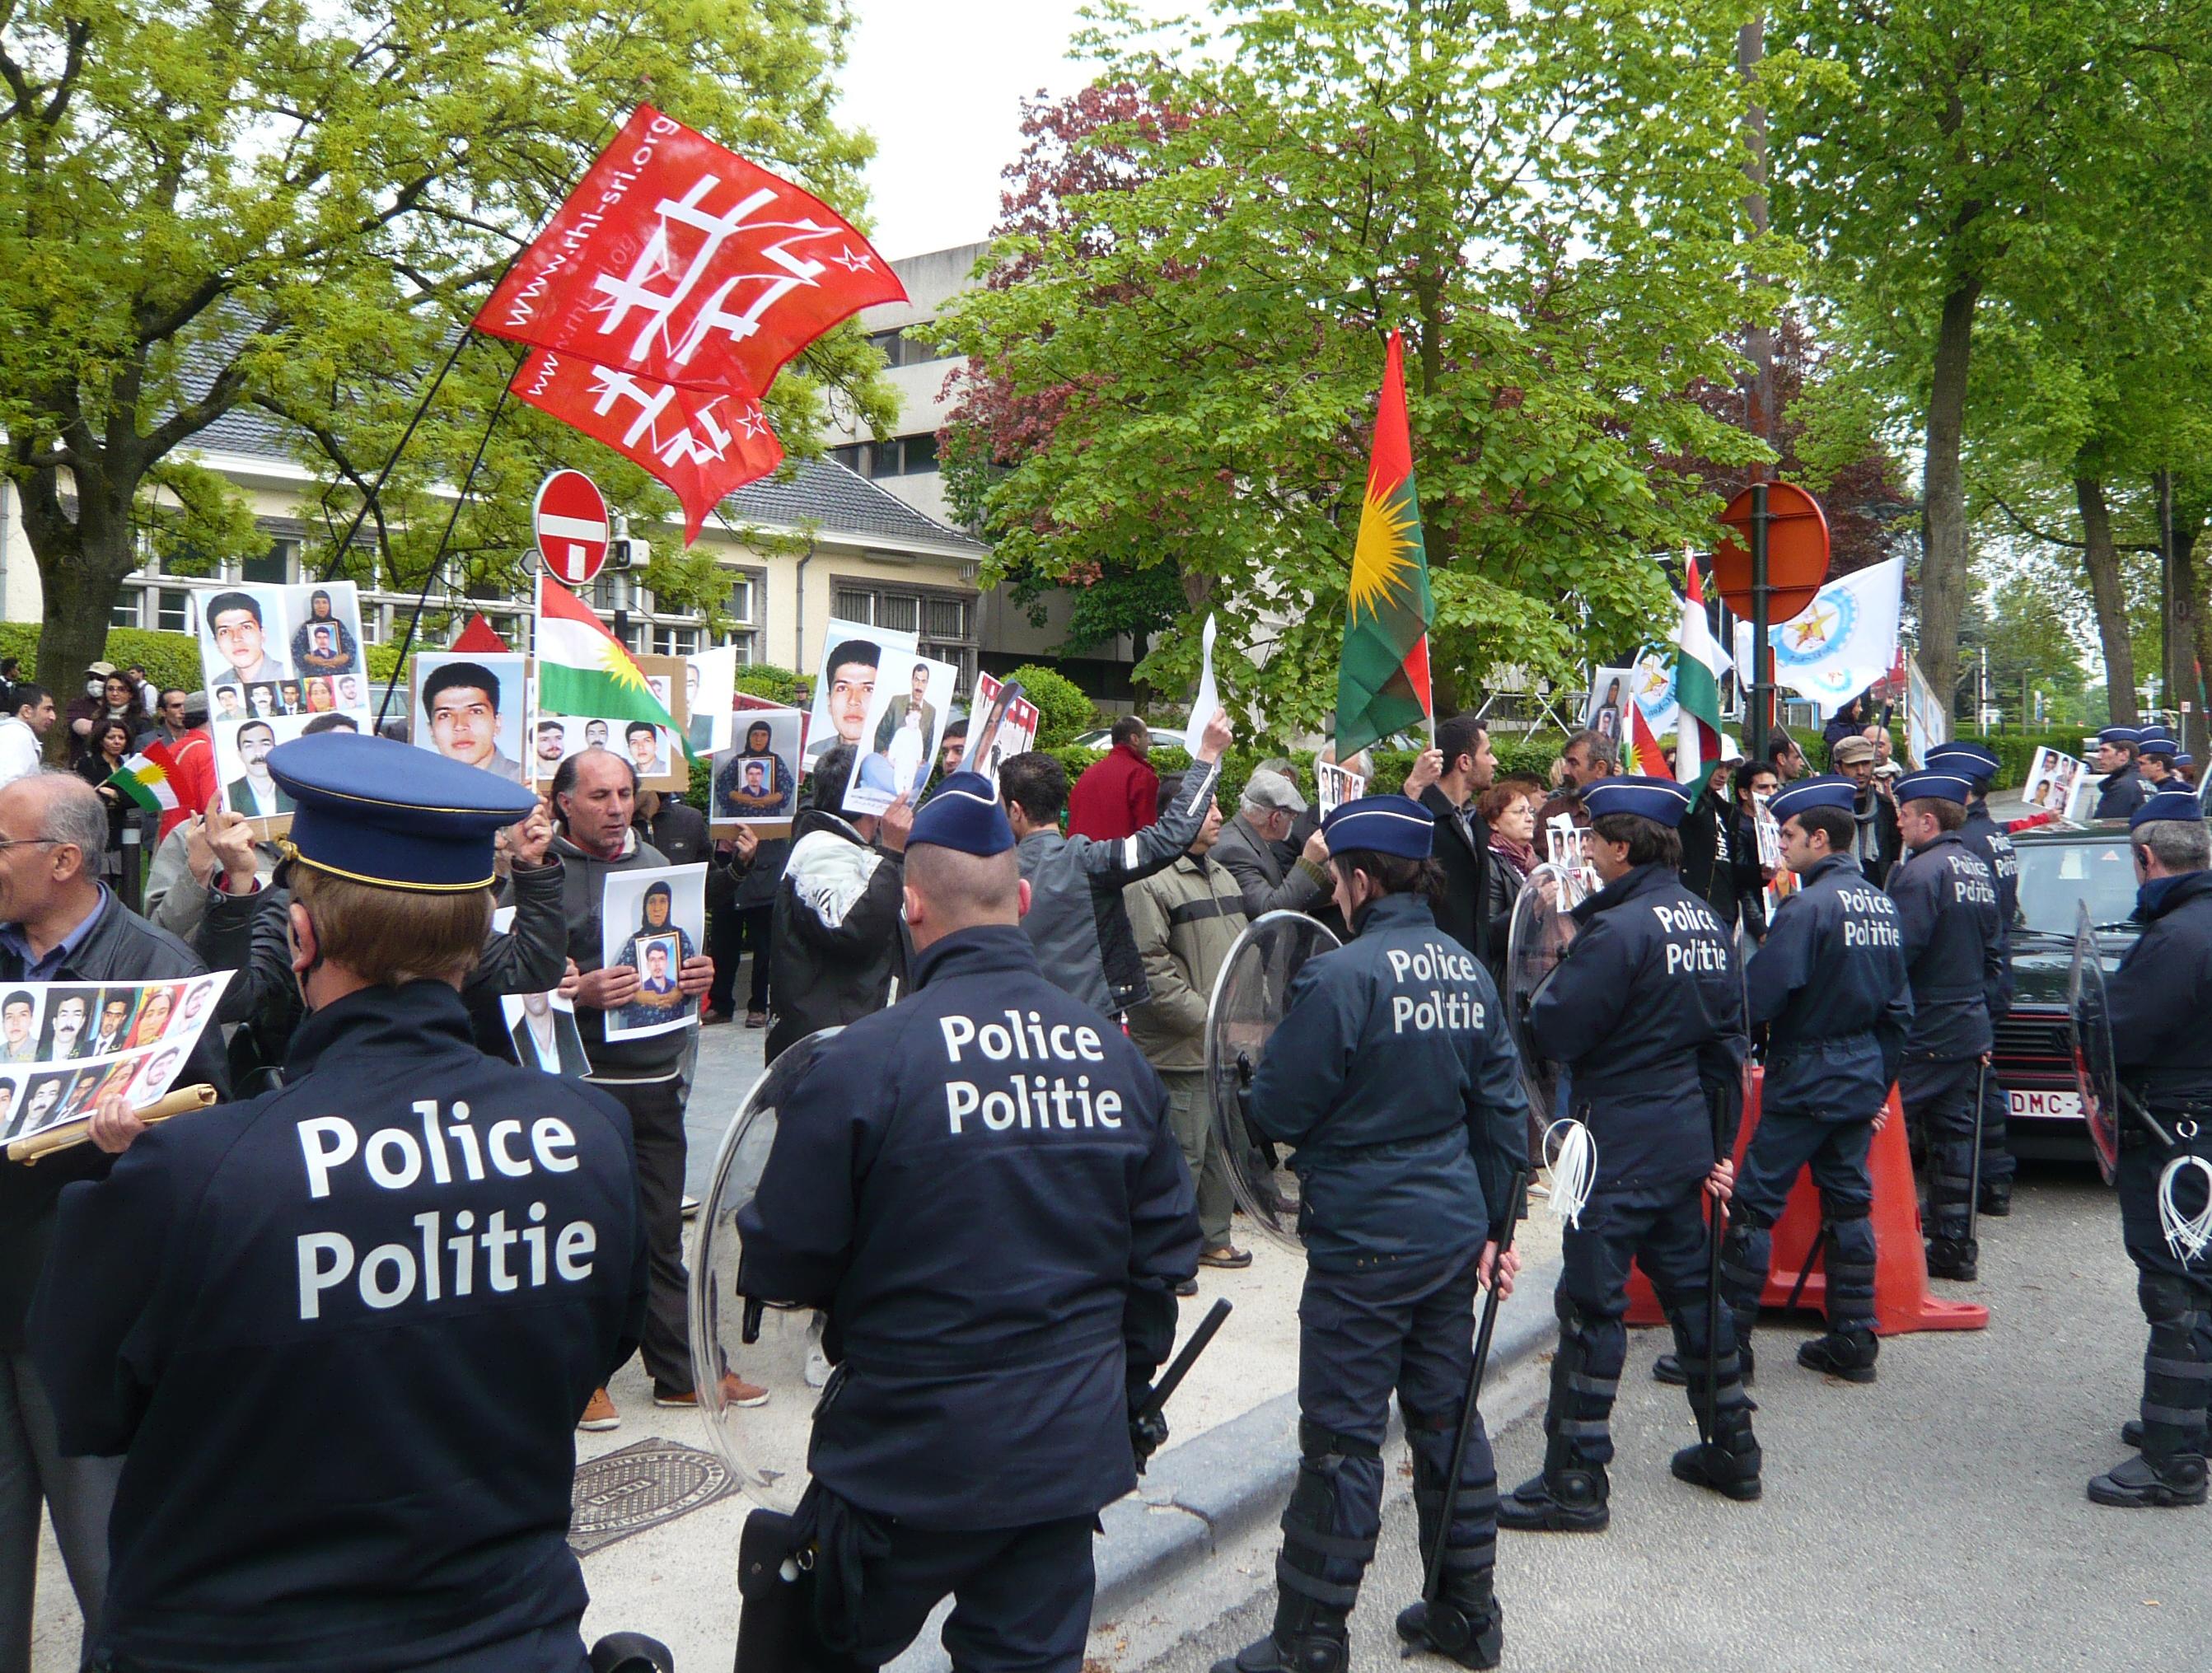 manifestation devant l'ambassade d'Iran 10 mai 2010